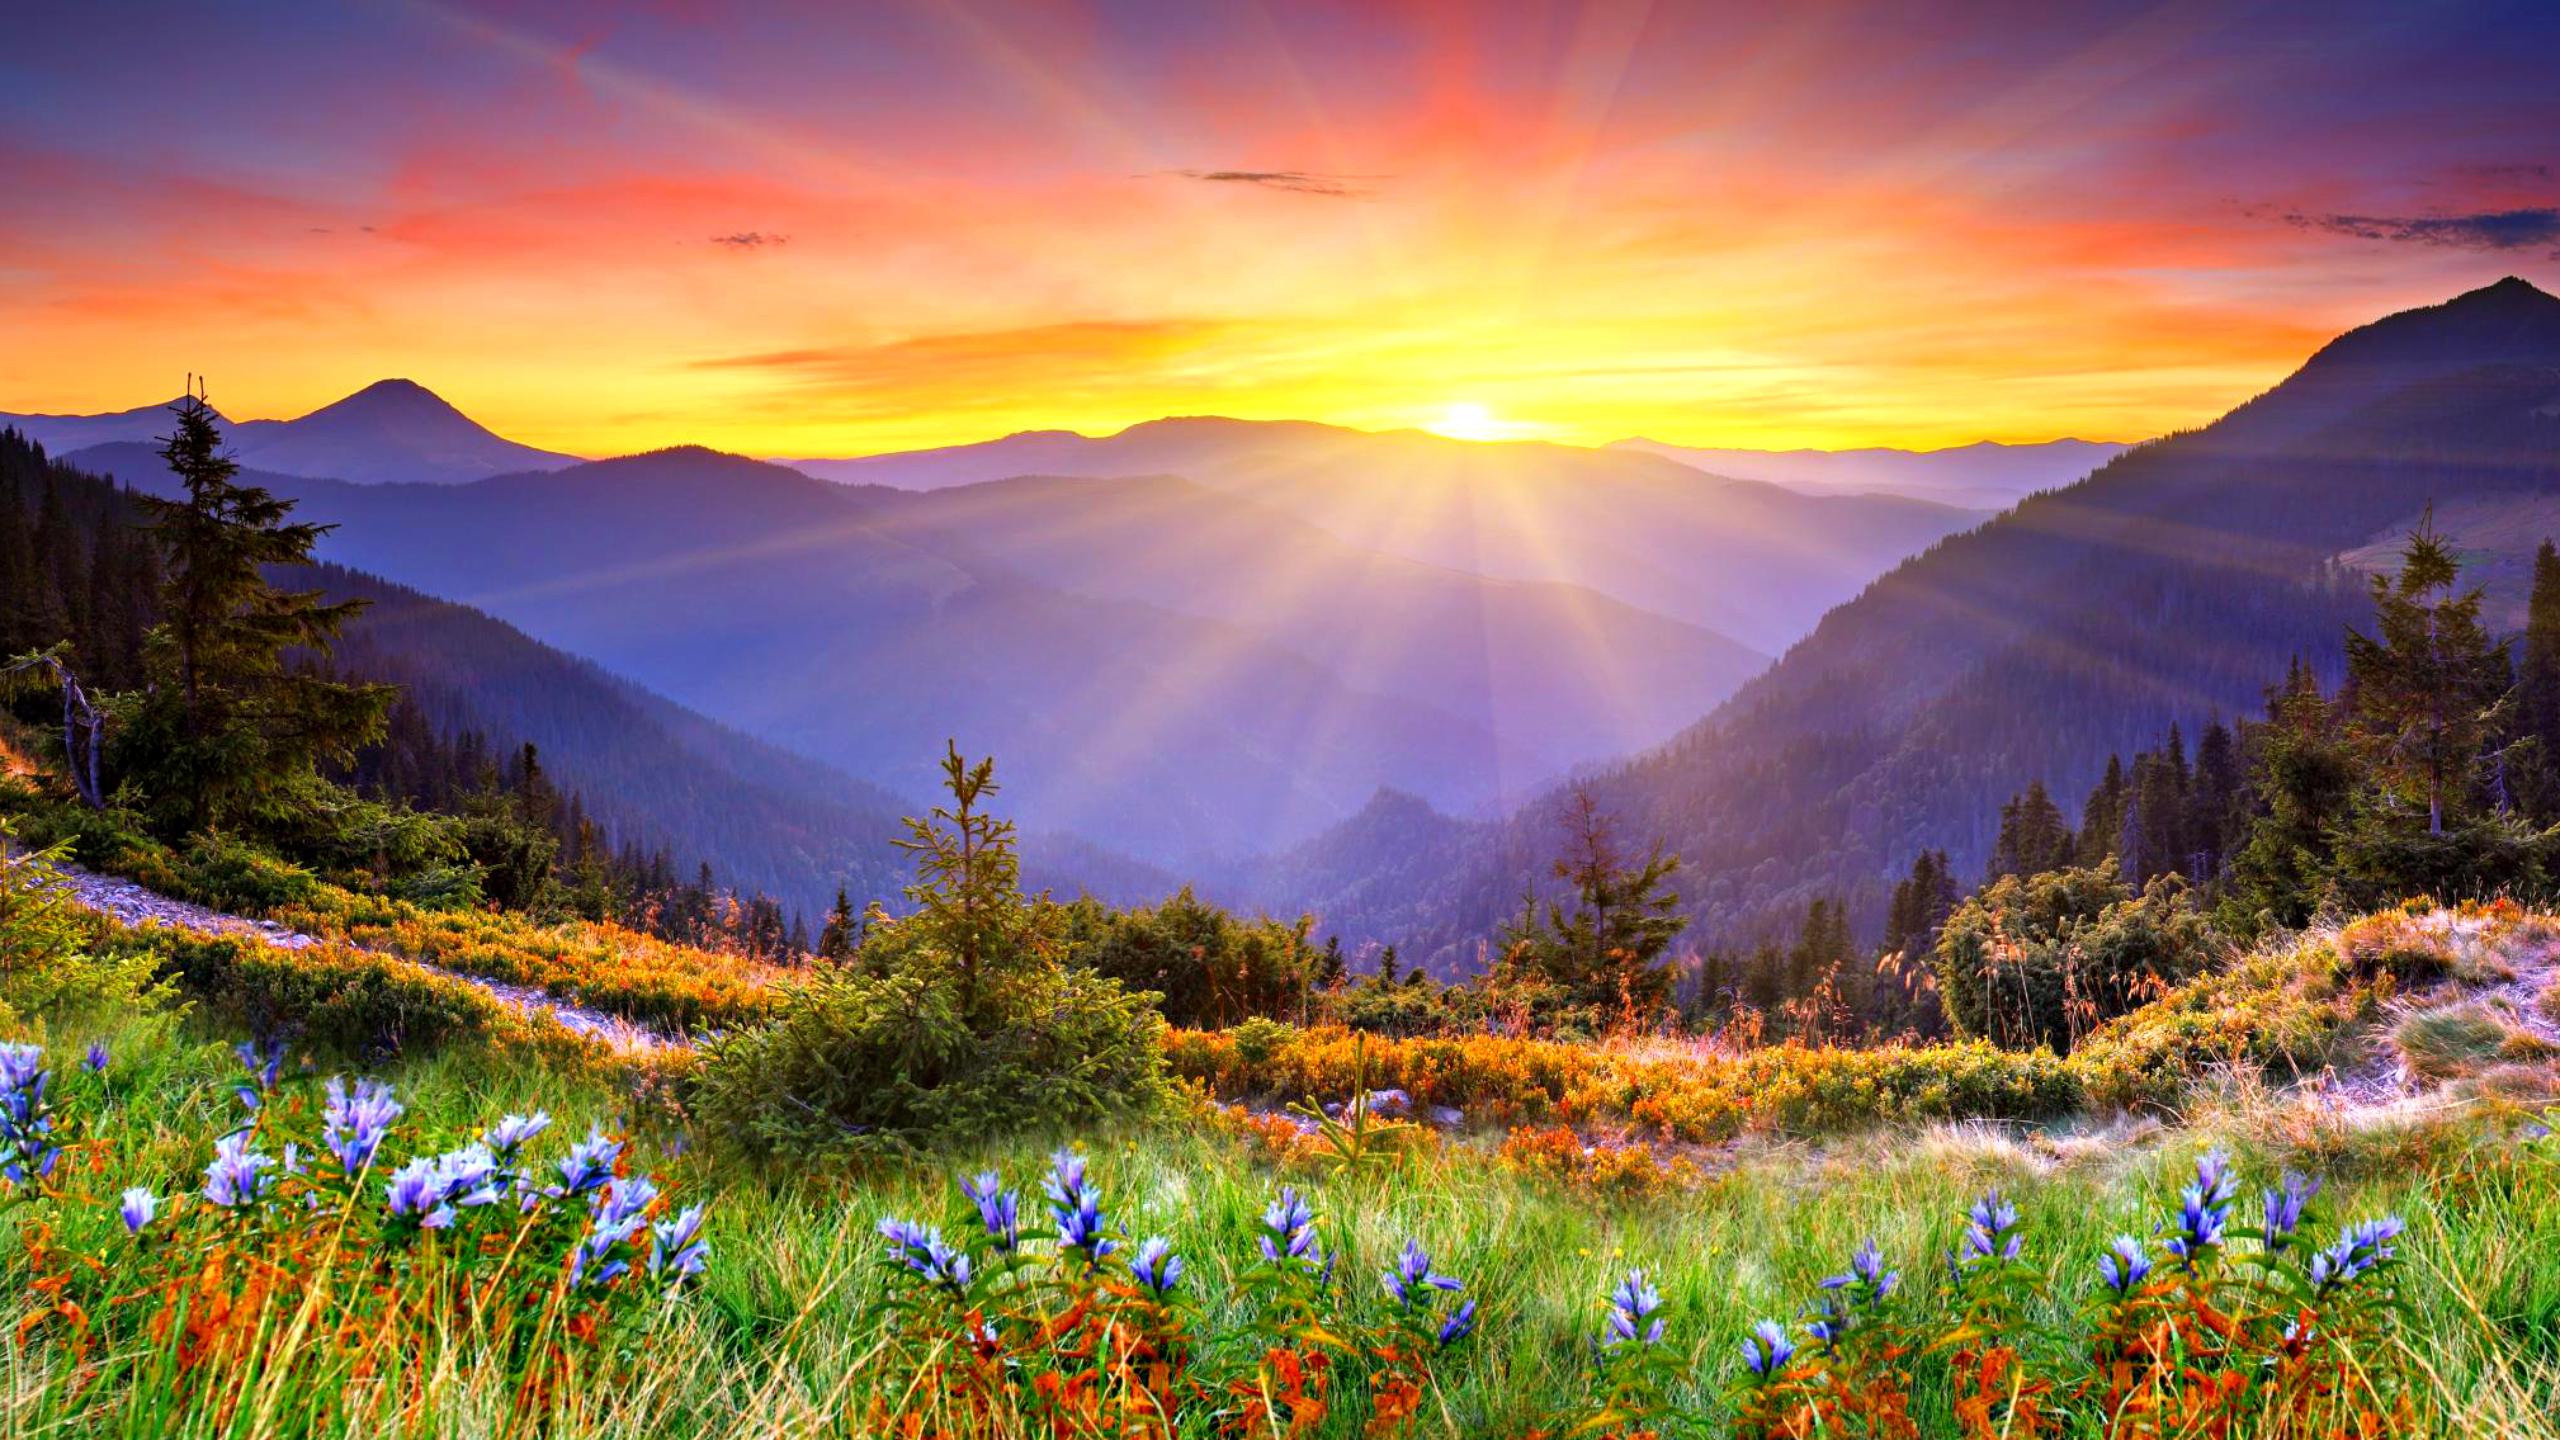 Beautiful Sunrise Wallpaper 34171 34940 Hd Wallpapersjpg 2560x1440